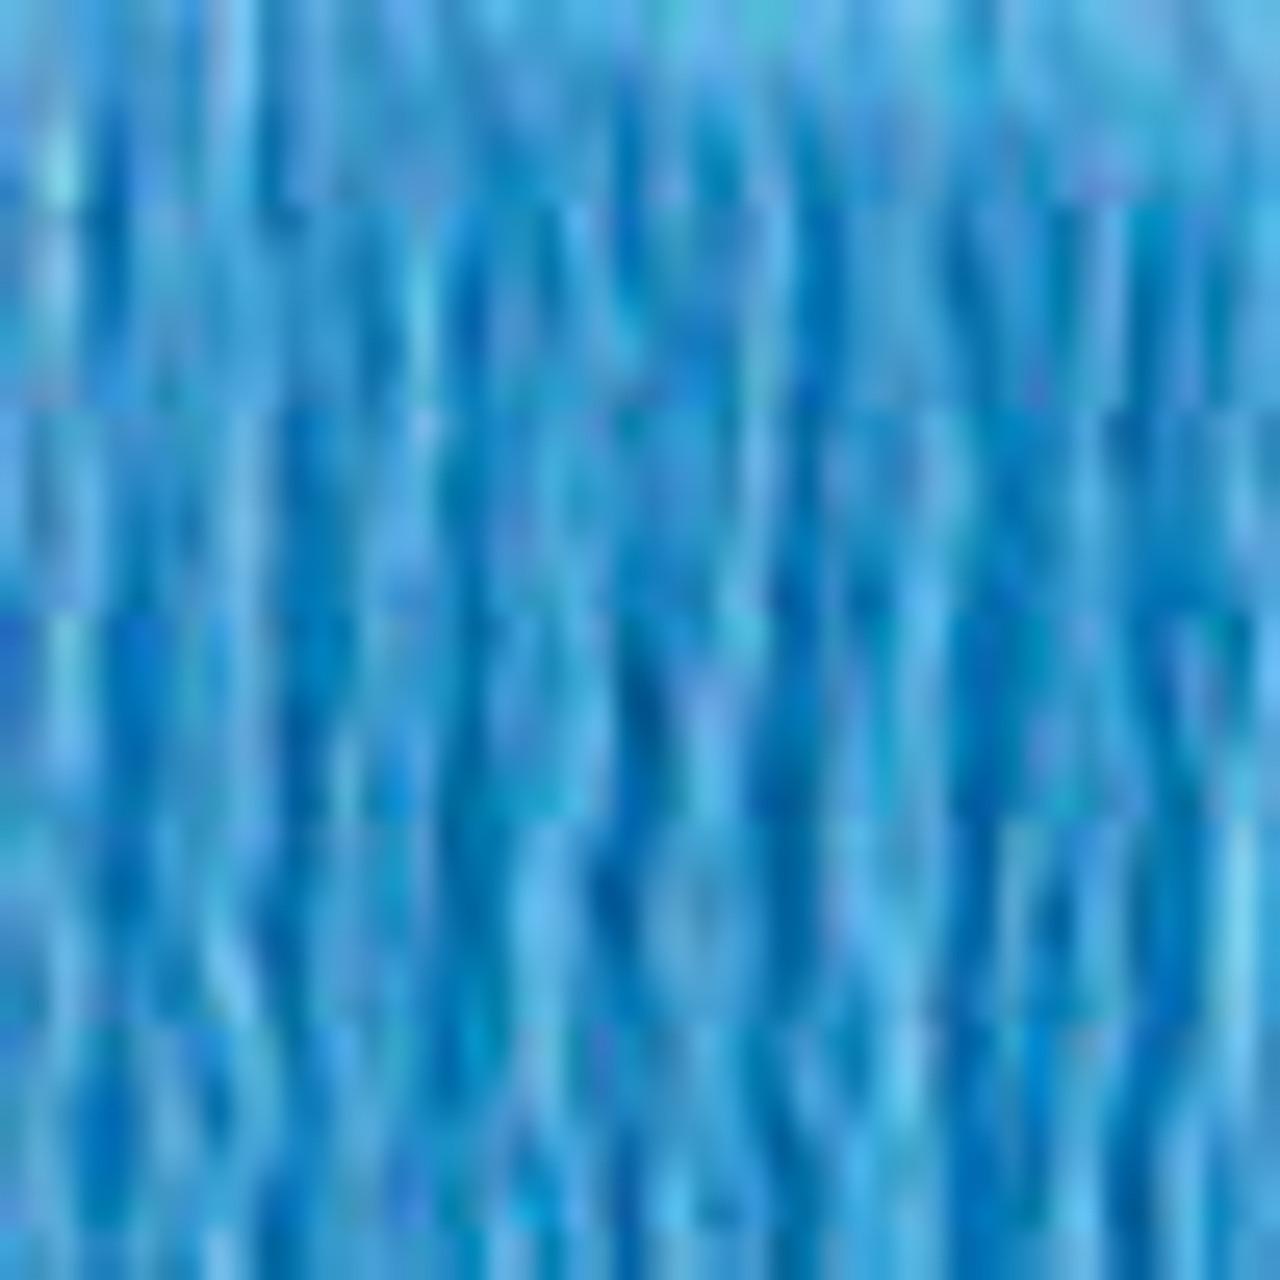 DMC # 826 Medium Blue Floss / Thread